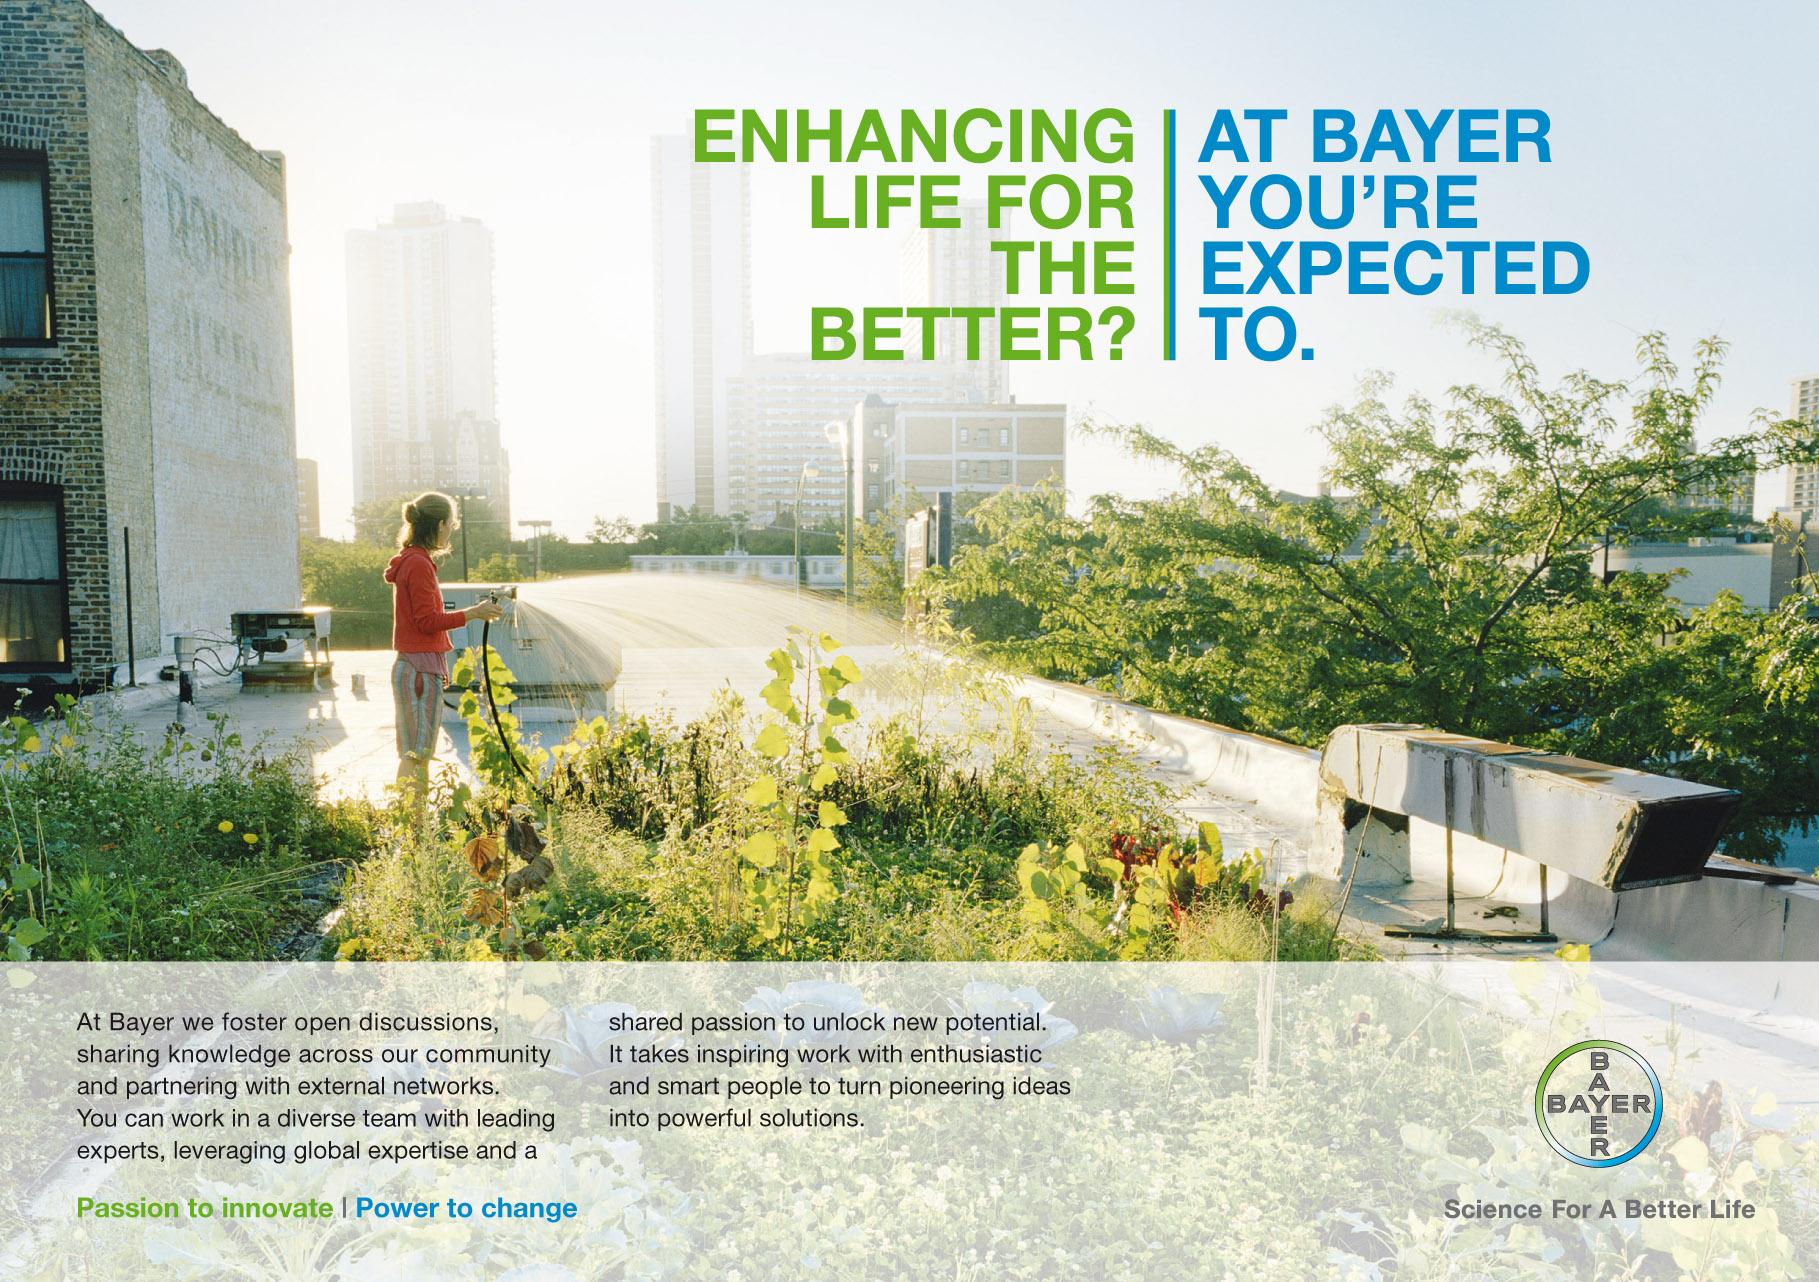 EB_Ad_Image_A5_Landscape_Gardening_Enhancing.jpg